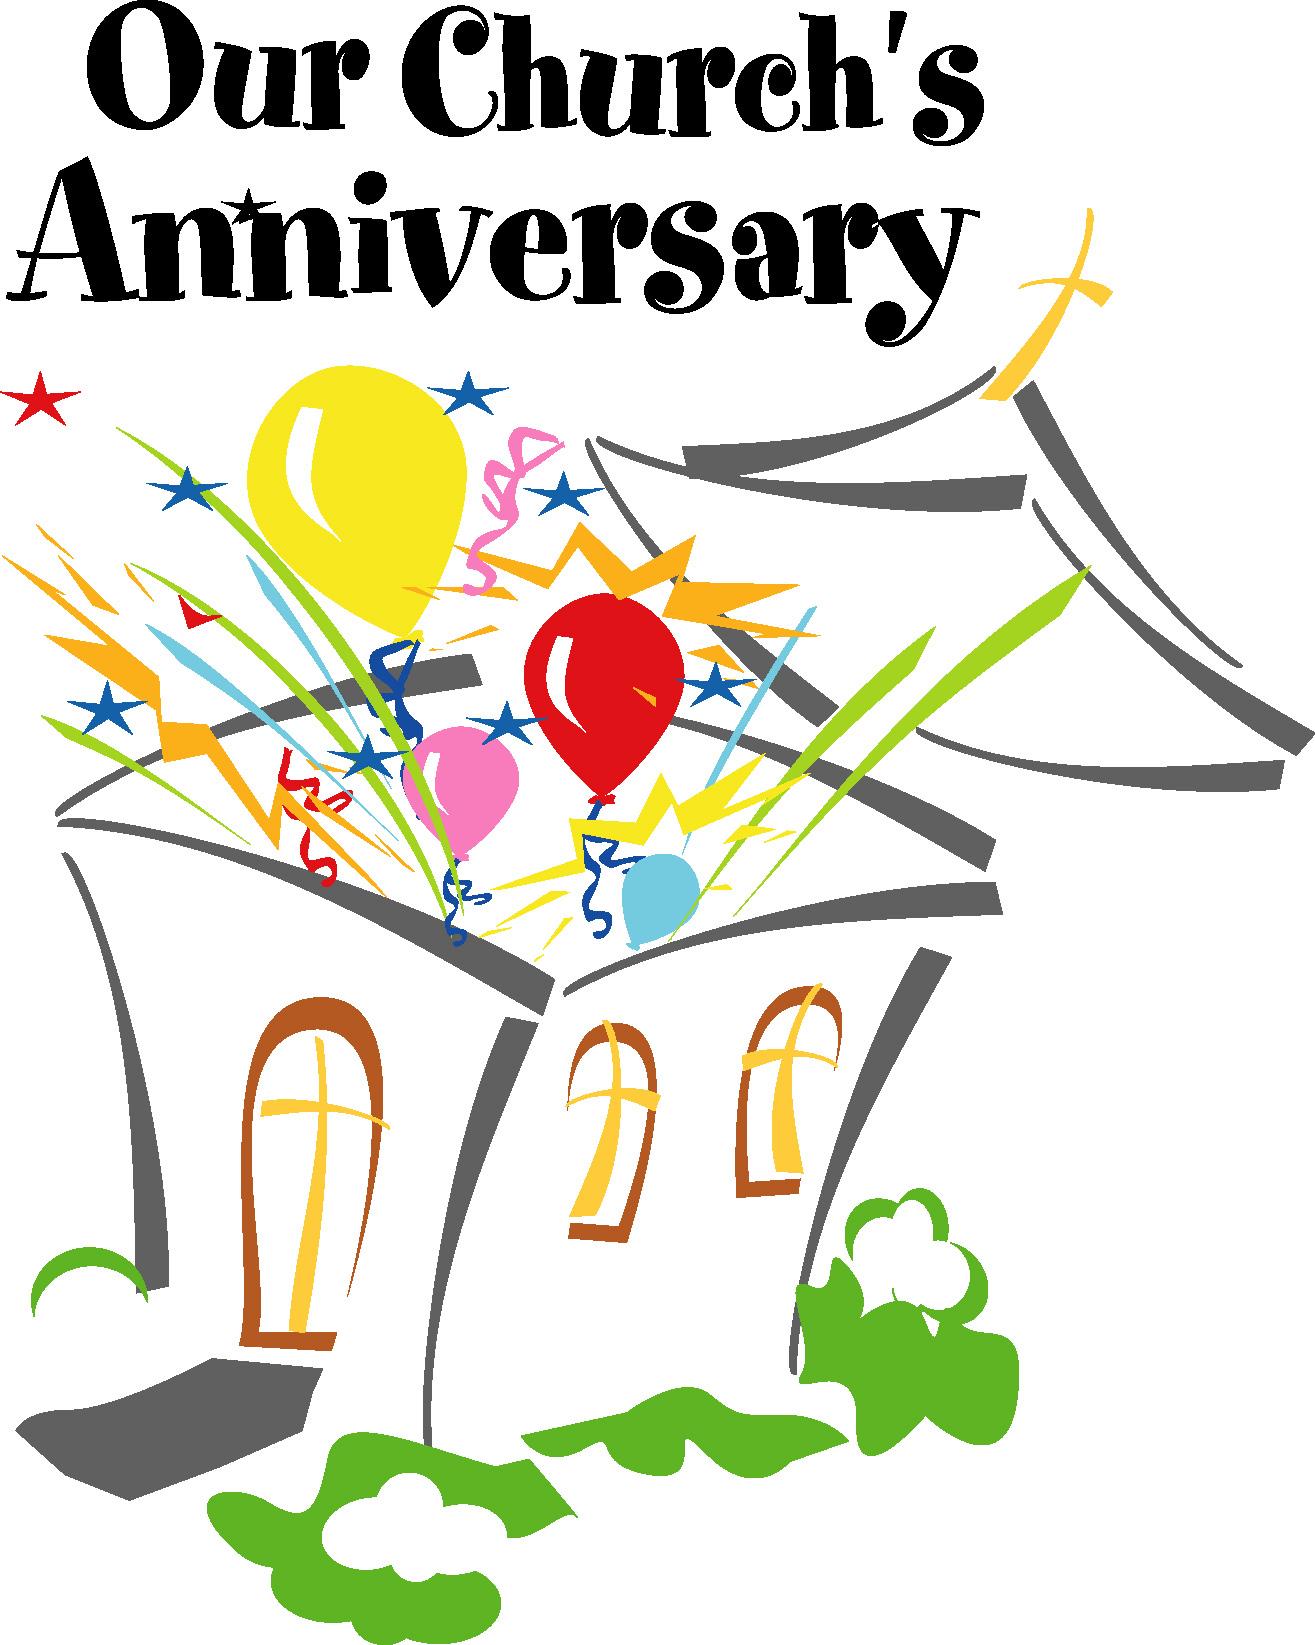 St Godwald S Church 130 Th Anniversary W-St Godwald S Church 130 Th Anniversary Weekend Of 7 Th 8 Th June-14